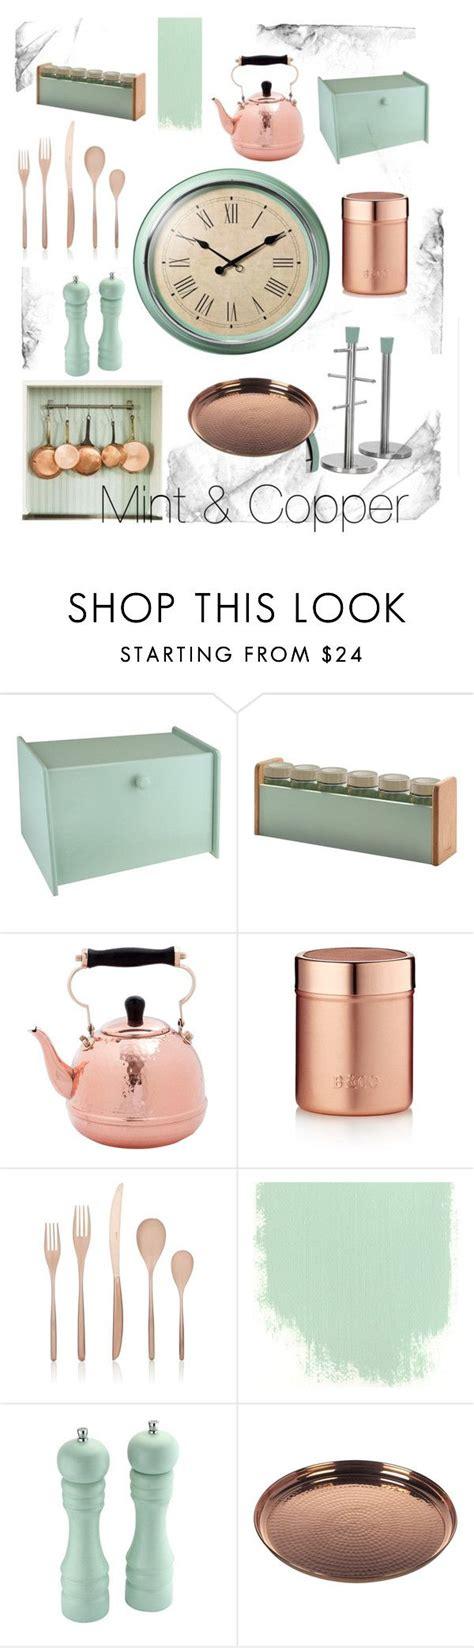 copper coloured kitchen accessories the 25 best copper color ideas on 5785